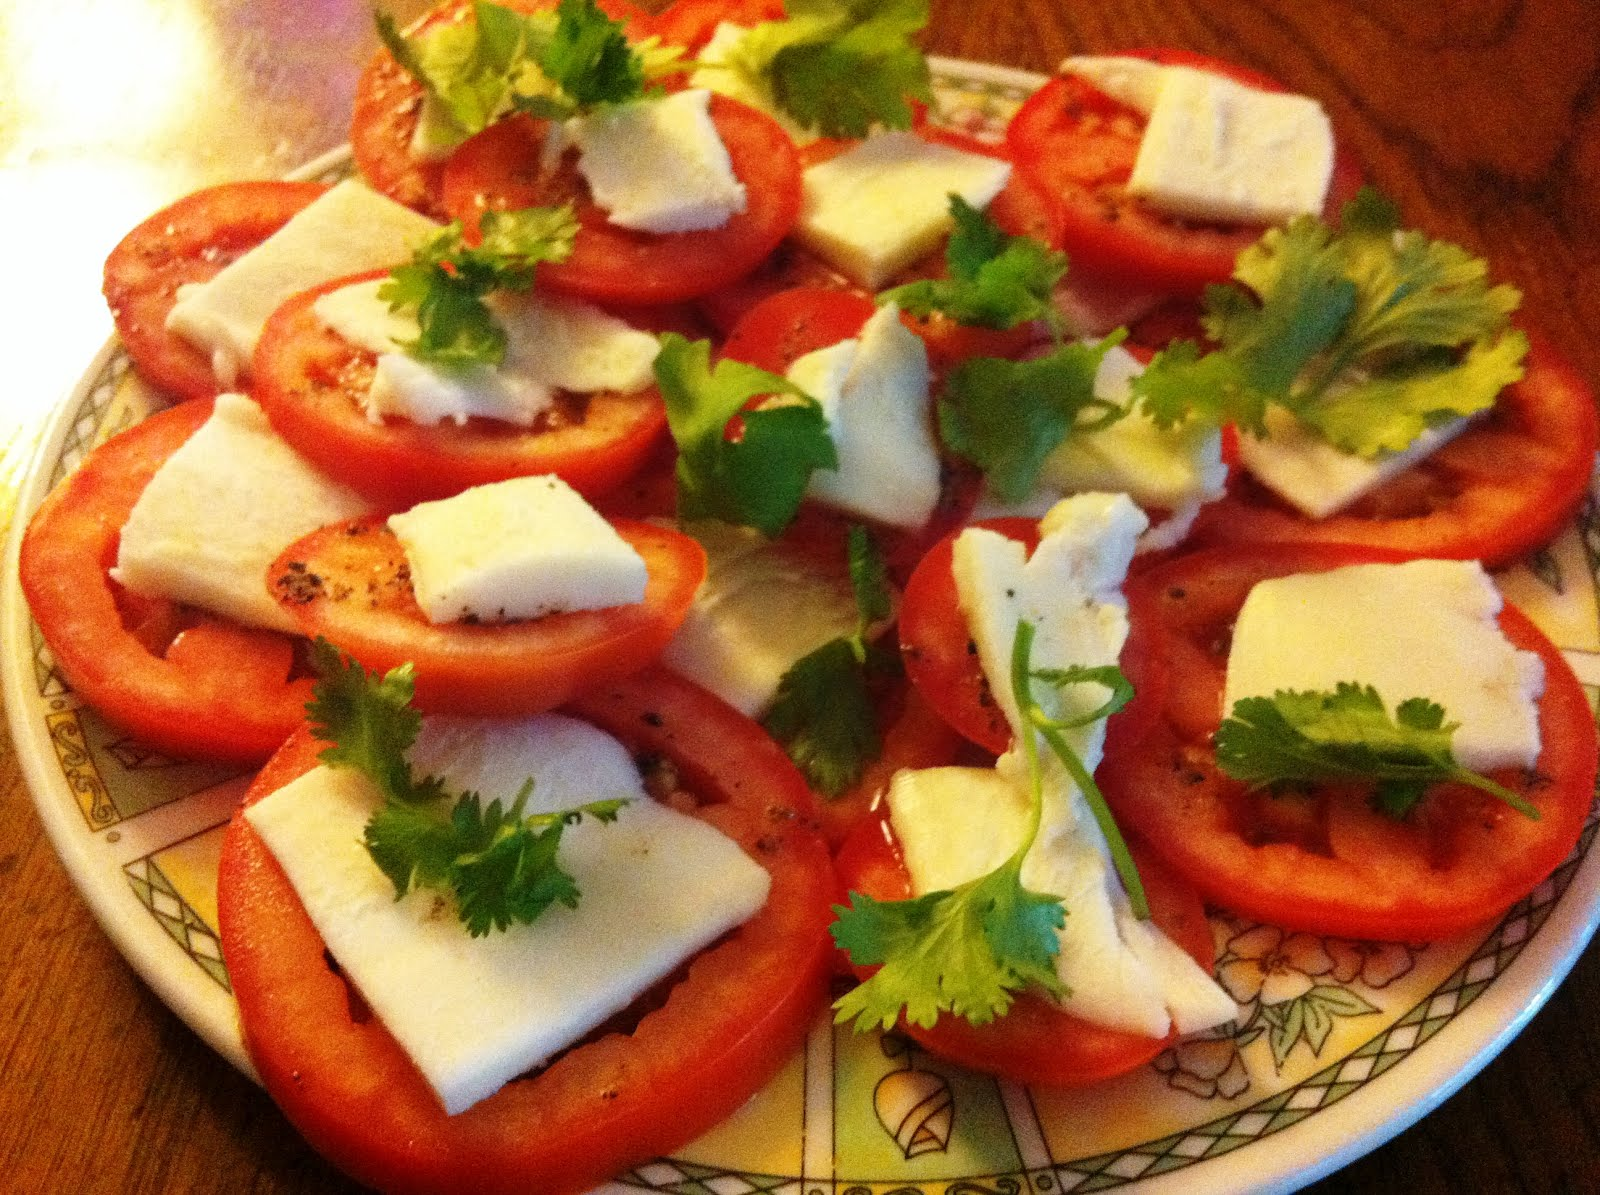 Bite Size Goodness: Cilantro Caprese Salad